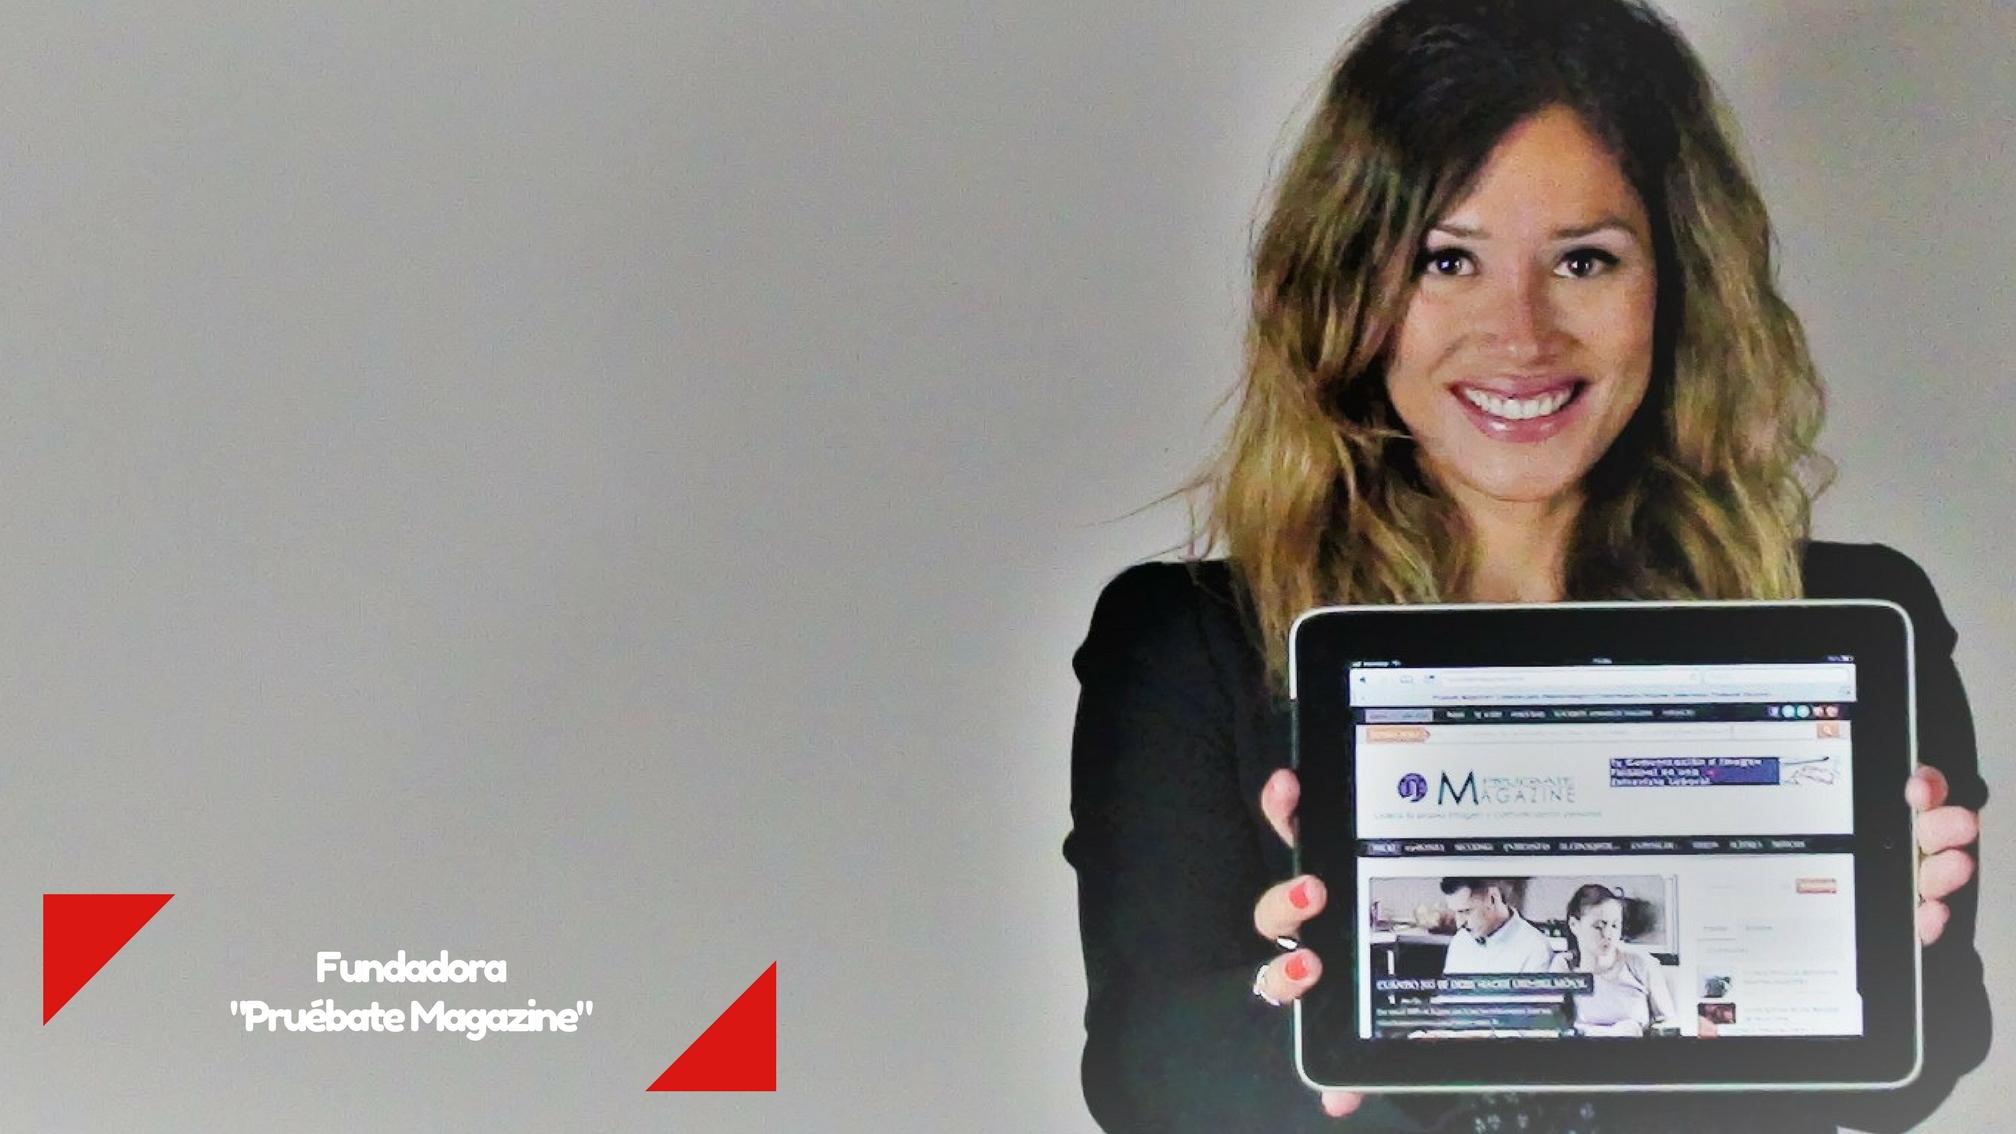 Marina Estacio Fundadora Pruébate Magazine Comunicación